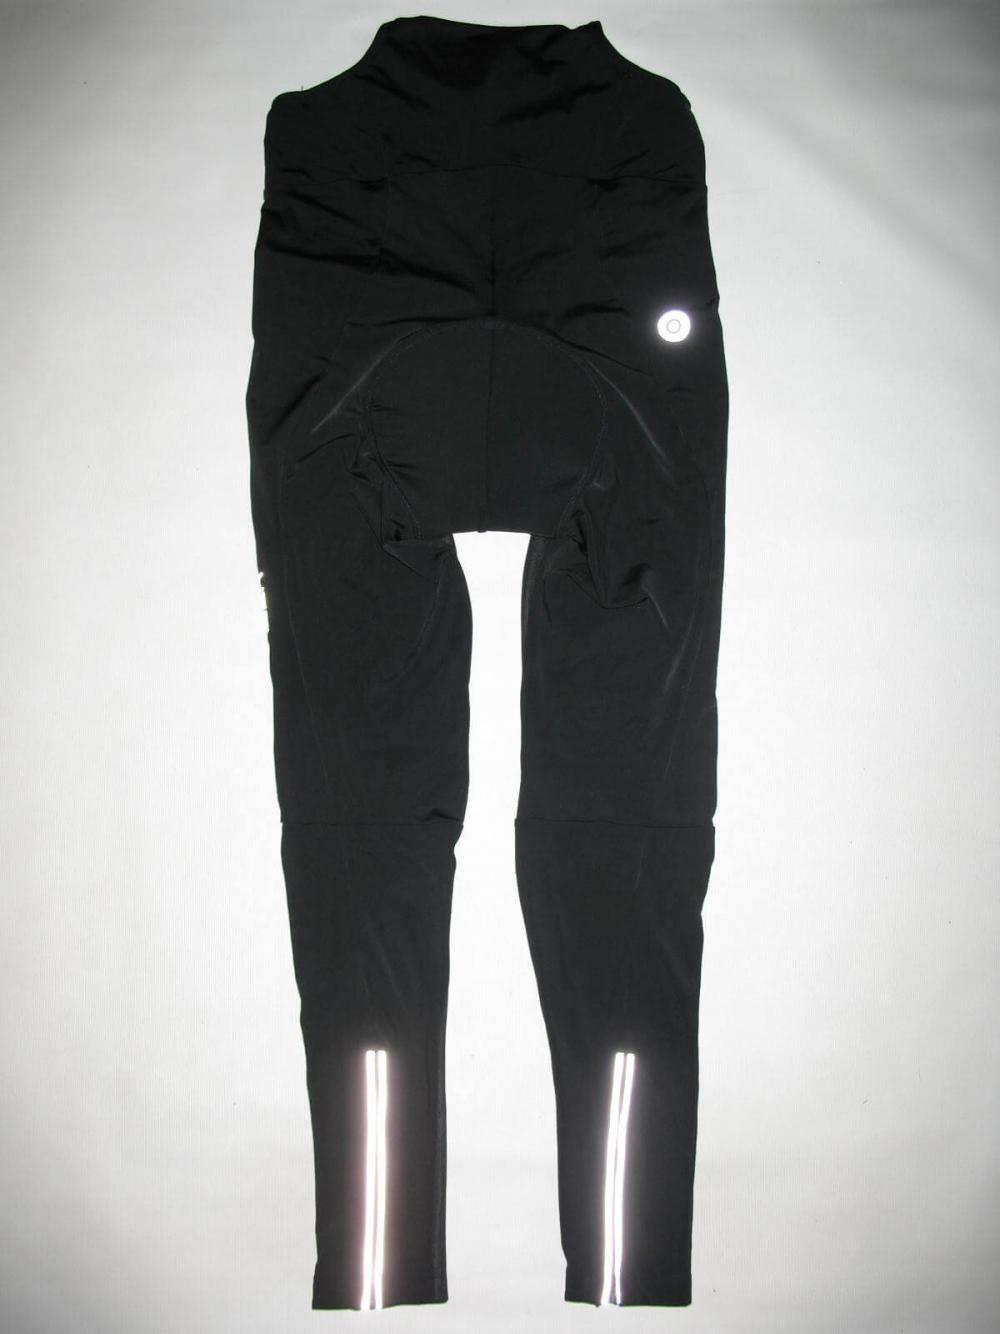 Брюки RACER bib pants (размер S/M) - 2